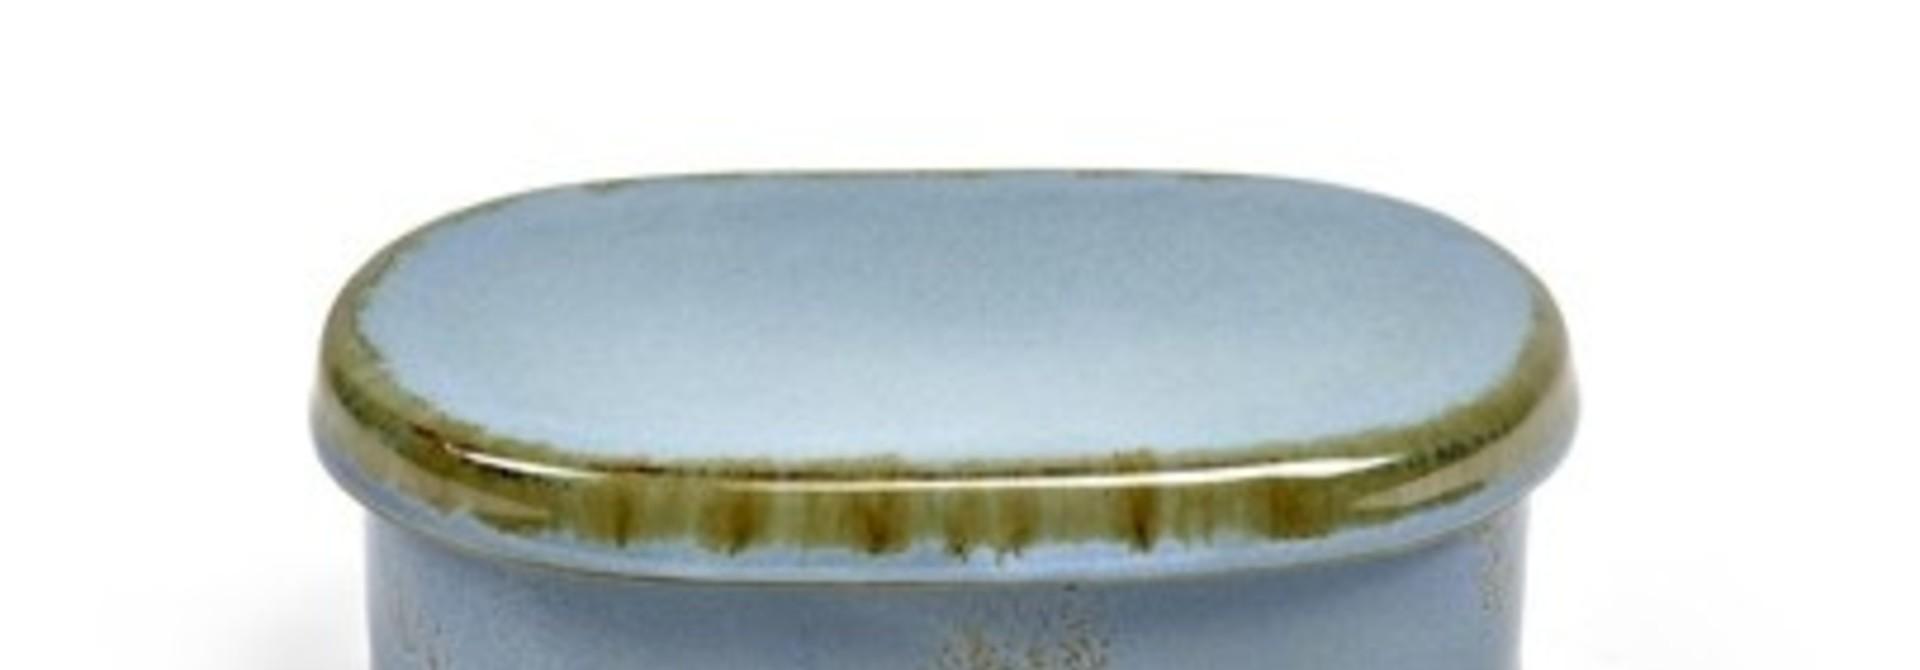 "6"" Ceramic Oval Butter Dish - Smokey Blue"